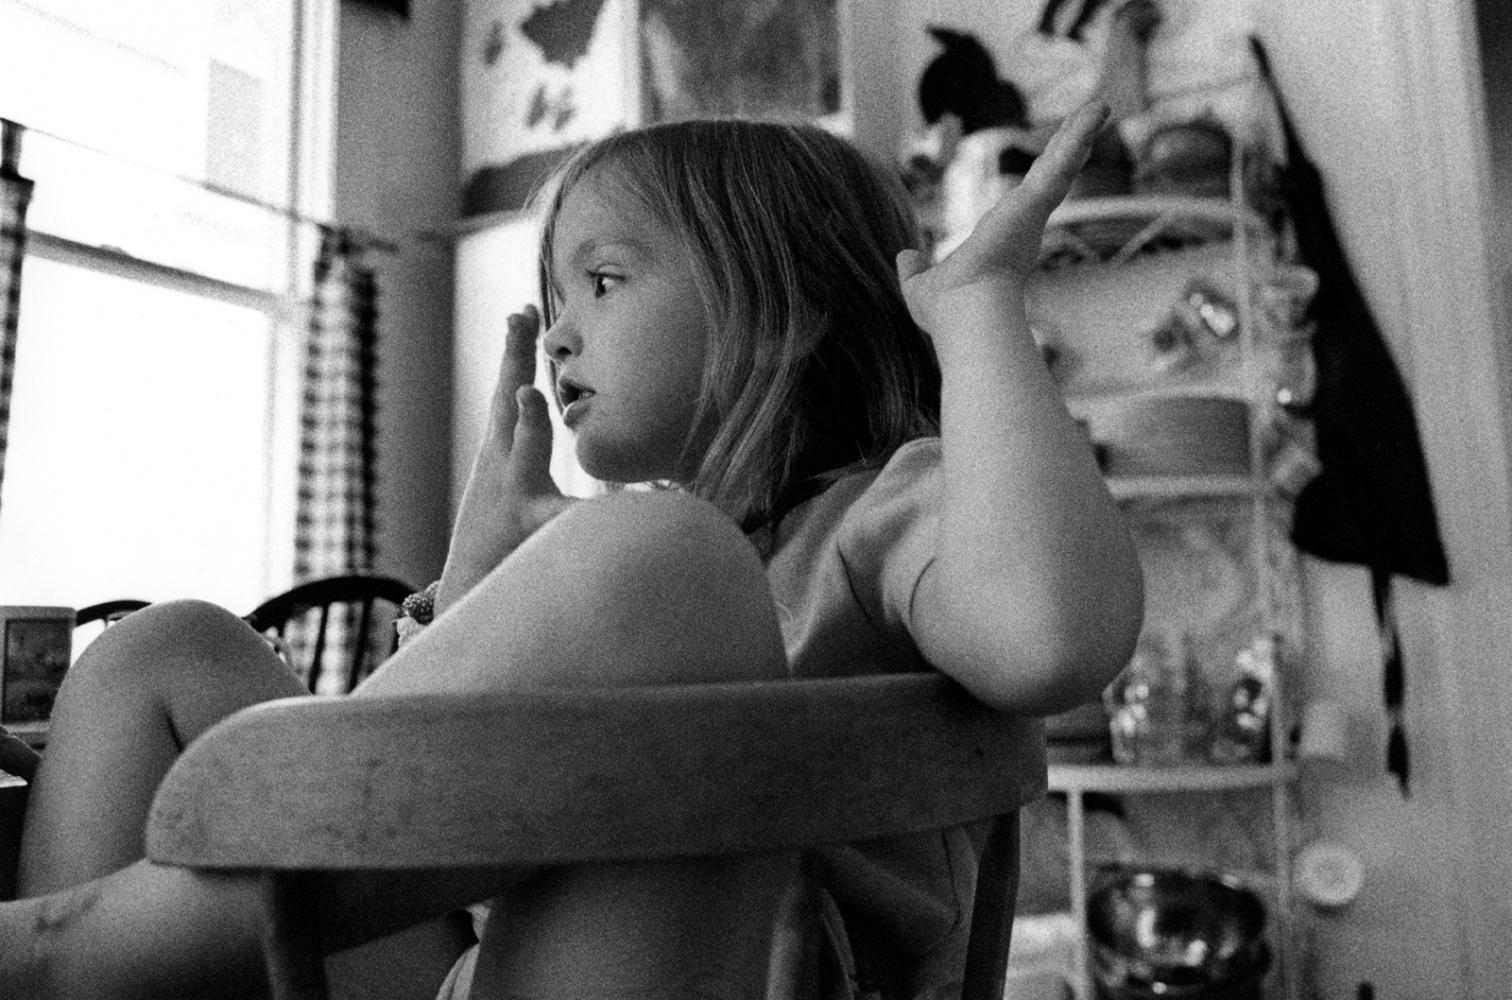 Art and Documentary Photography - Loading alesshandtomouth.jpg